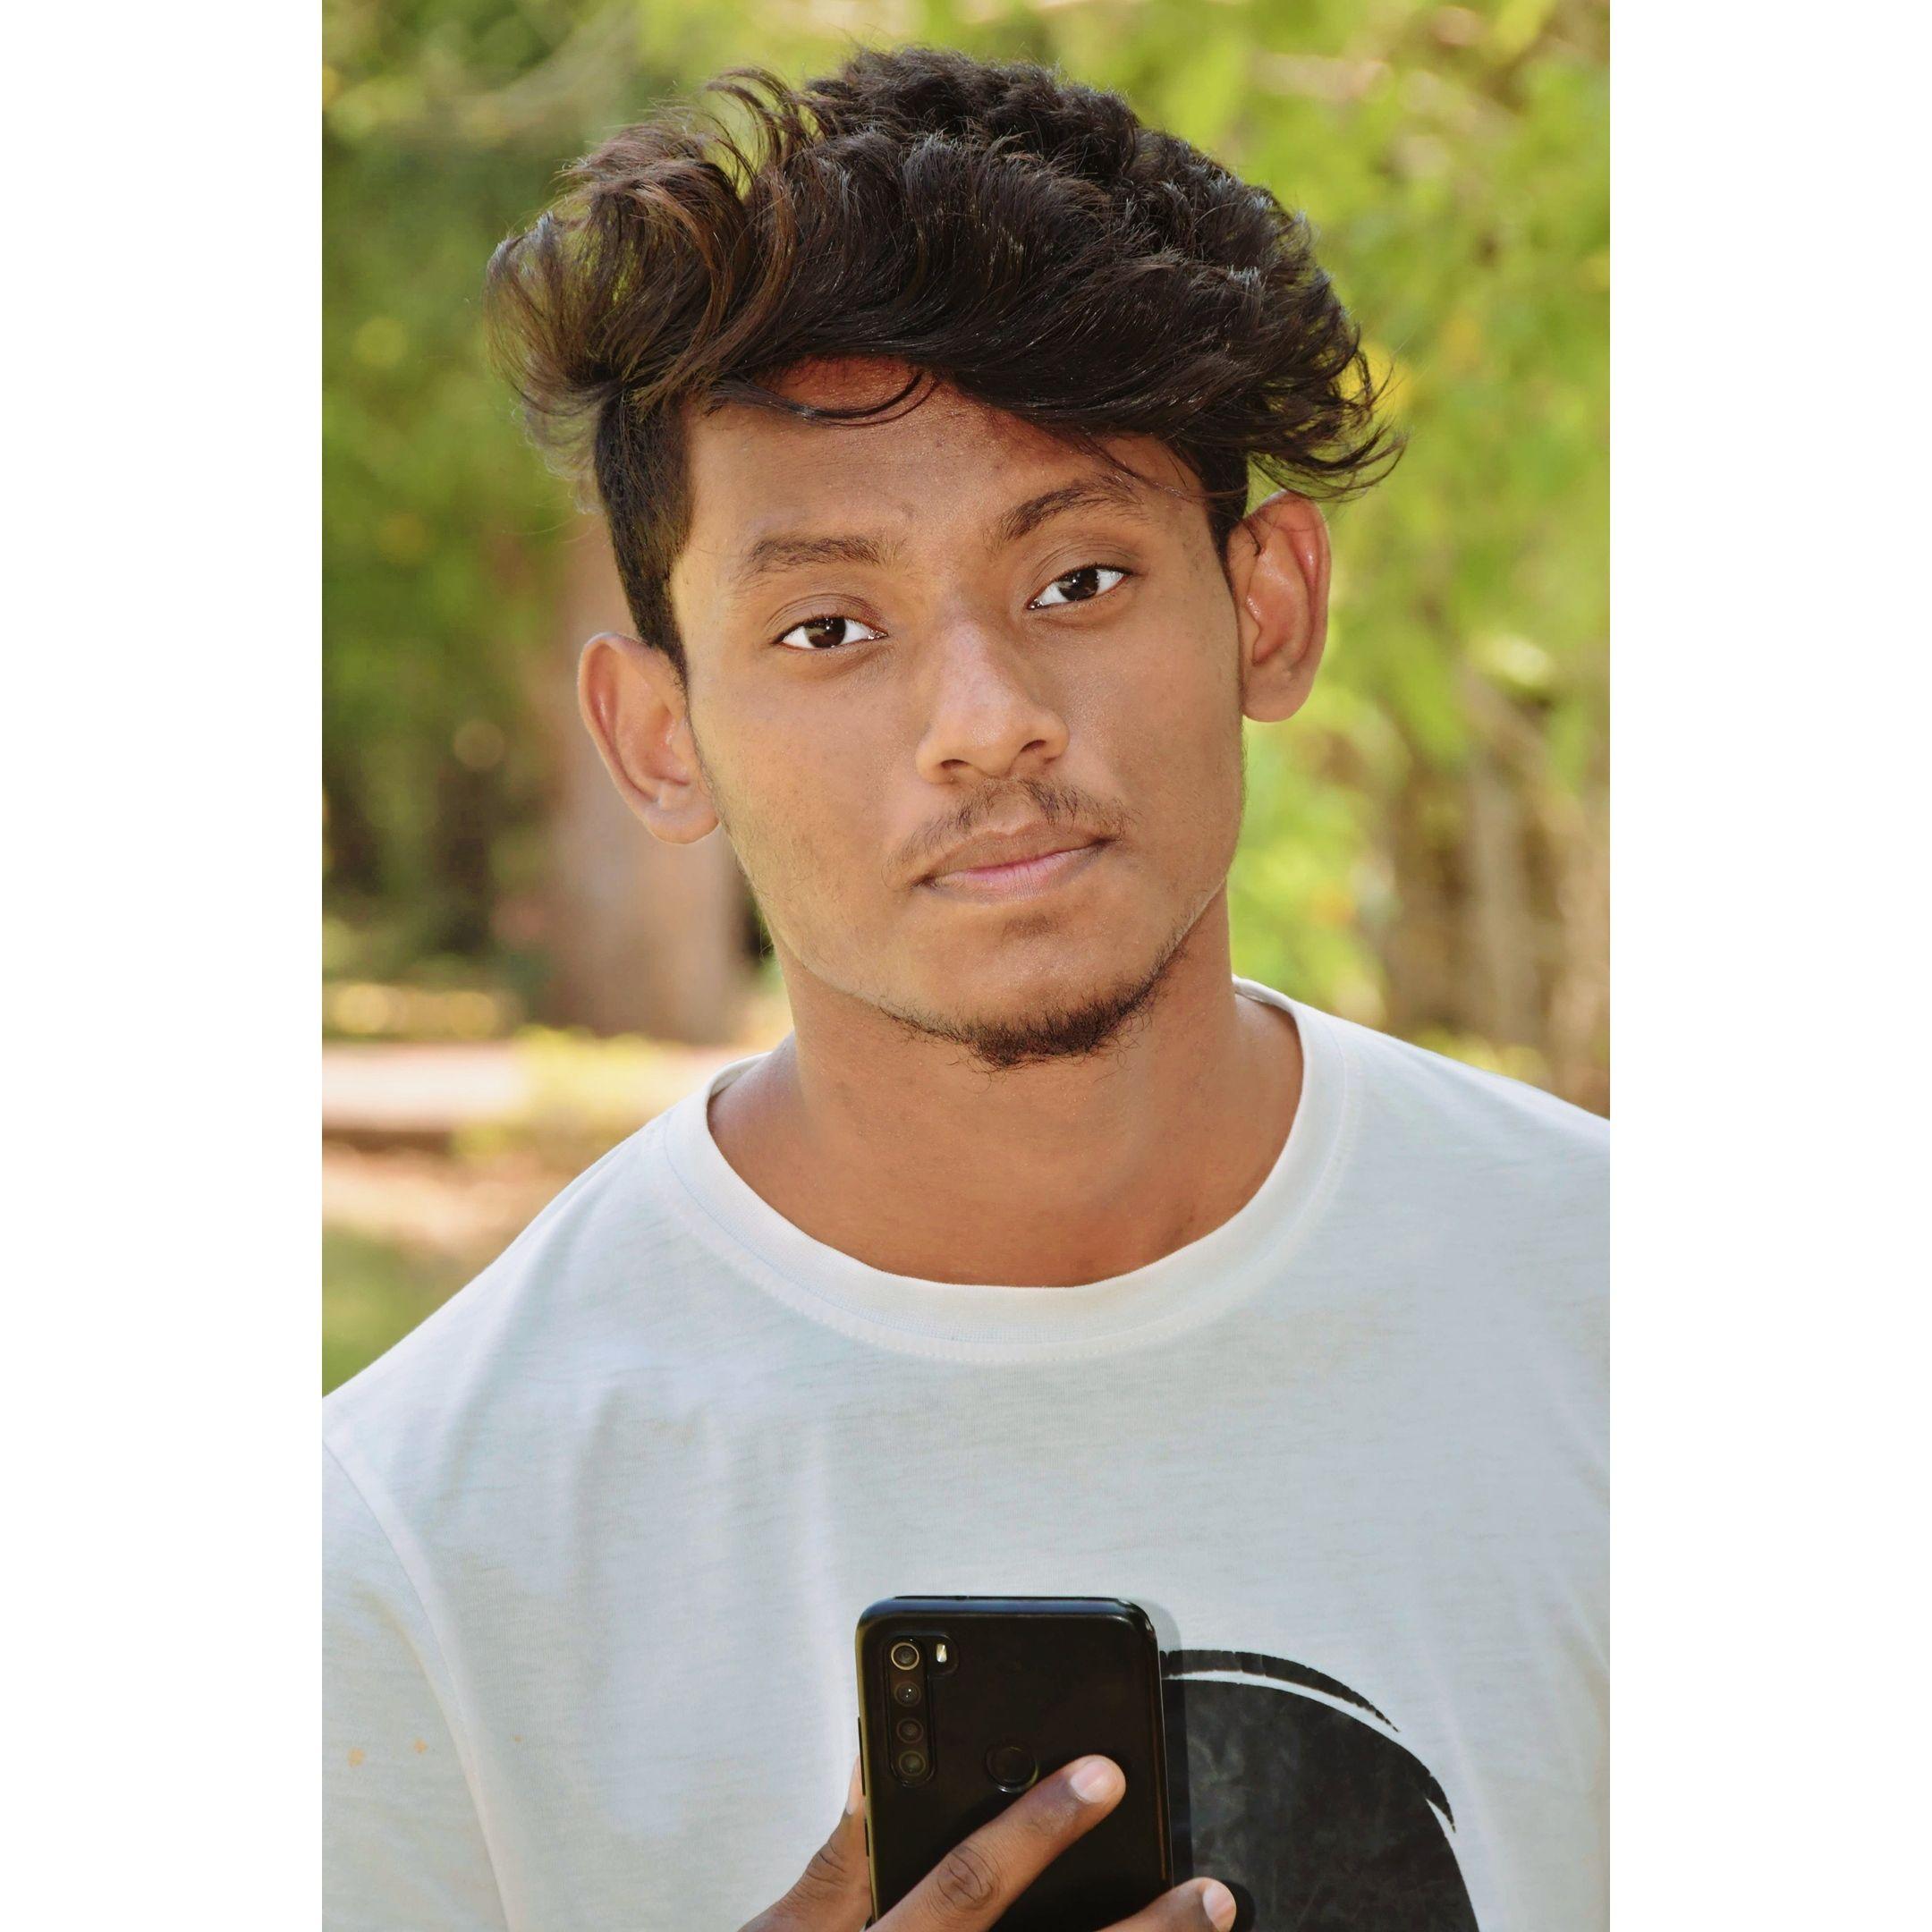 Chandrakant Sahu